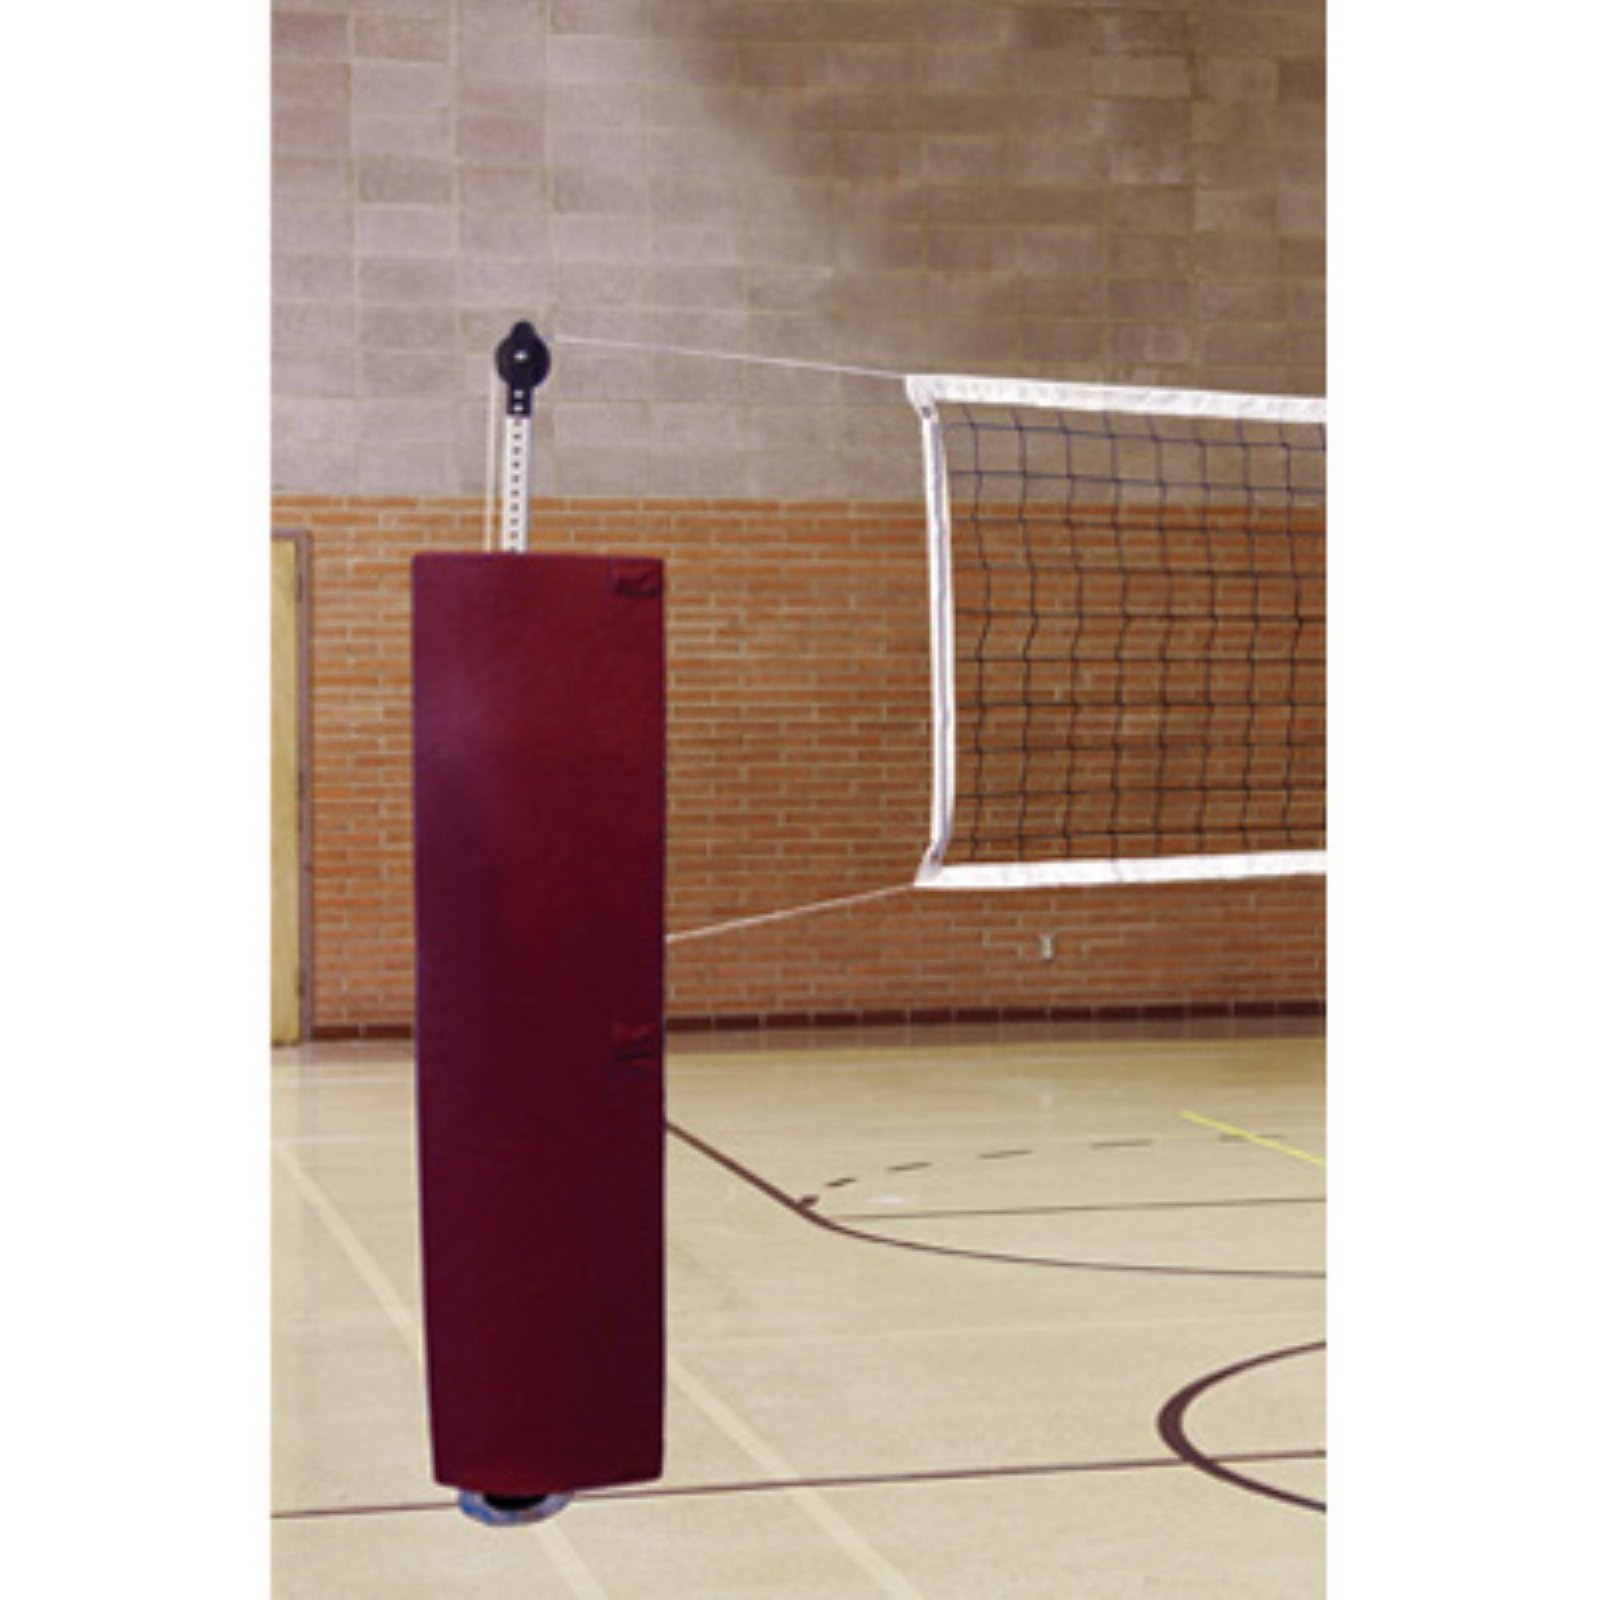 First Team QuickSet Steel Indoor/Outdoor Volleyball Set